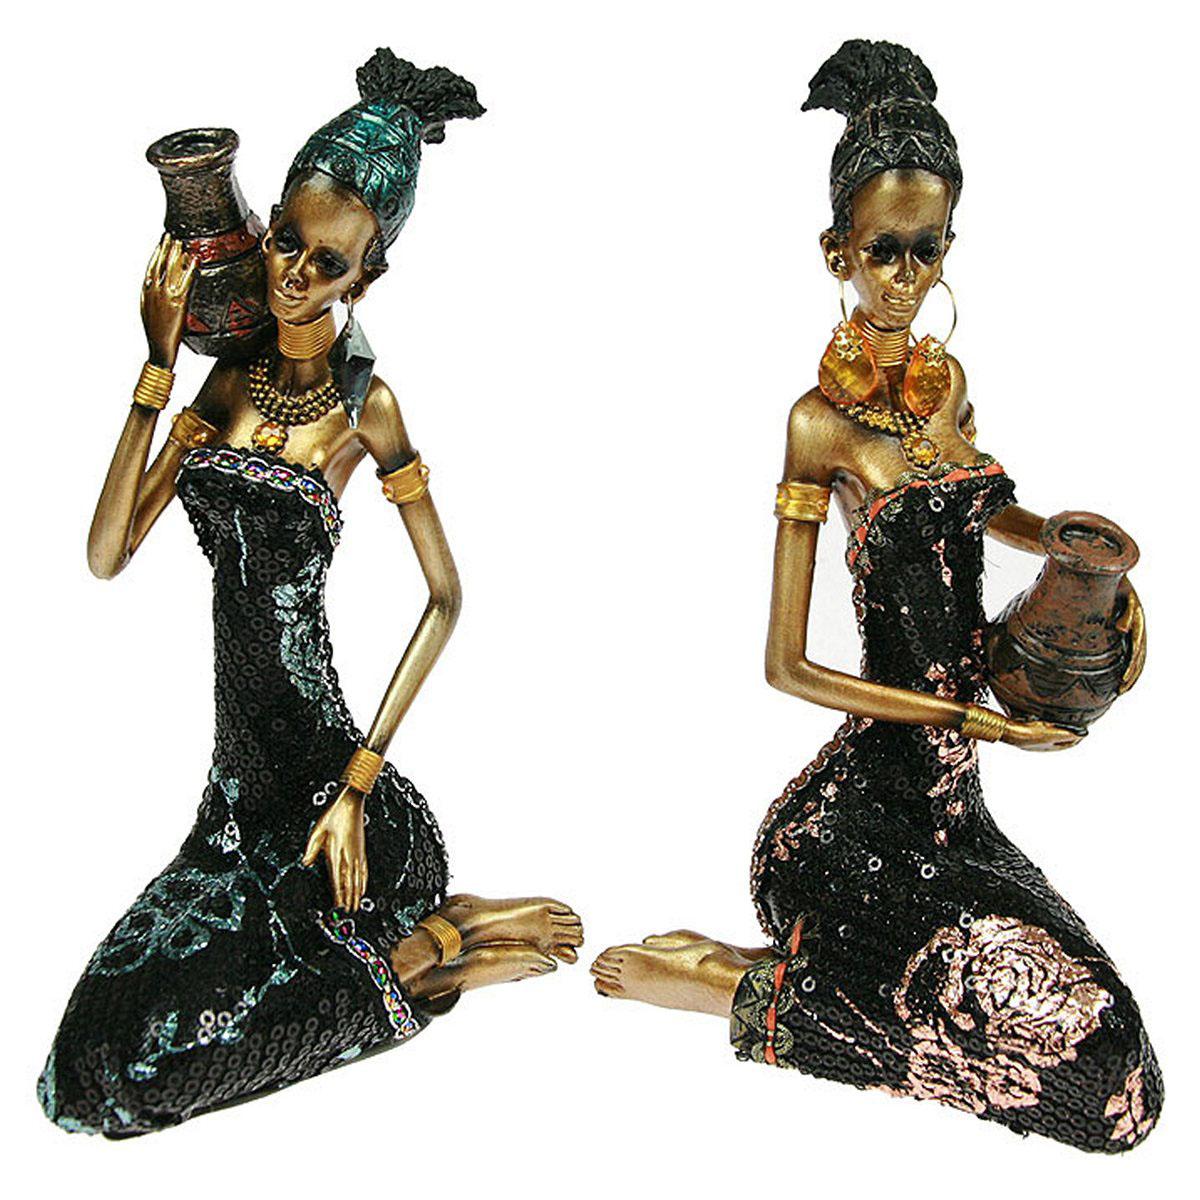 Статуэтка Русские Подарки Африканка, 10 х 11 х 19 см26122